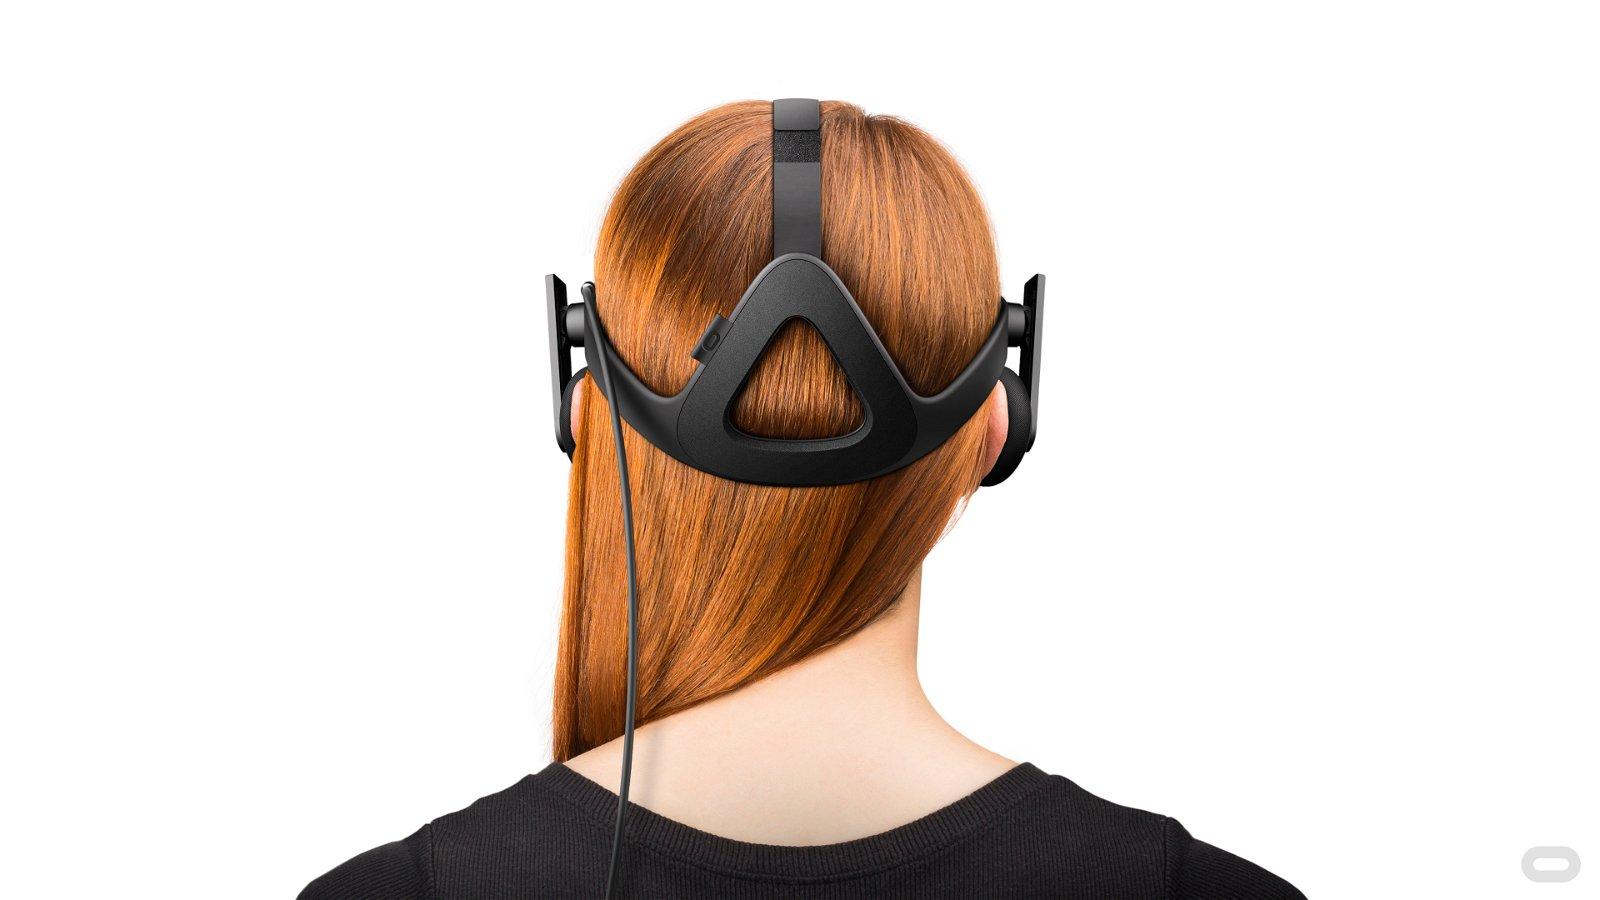 Oculus Rift (Hardware) Review 5